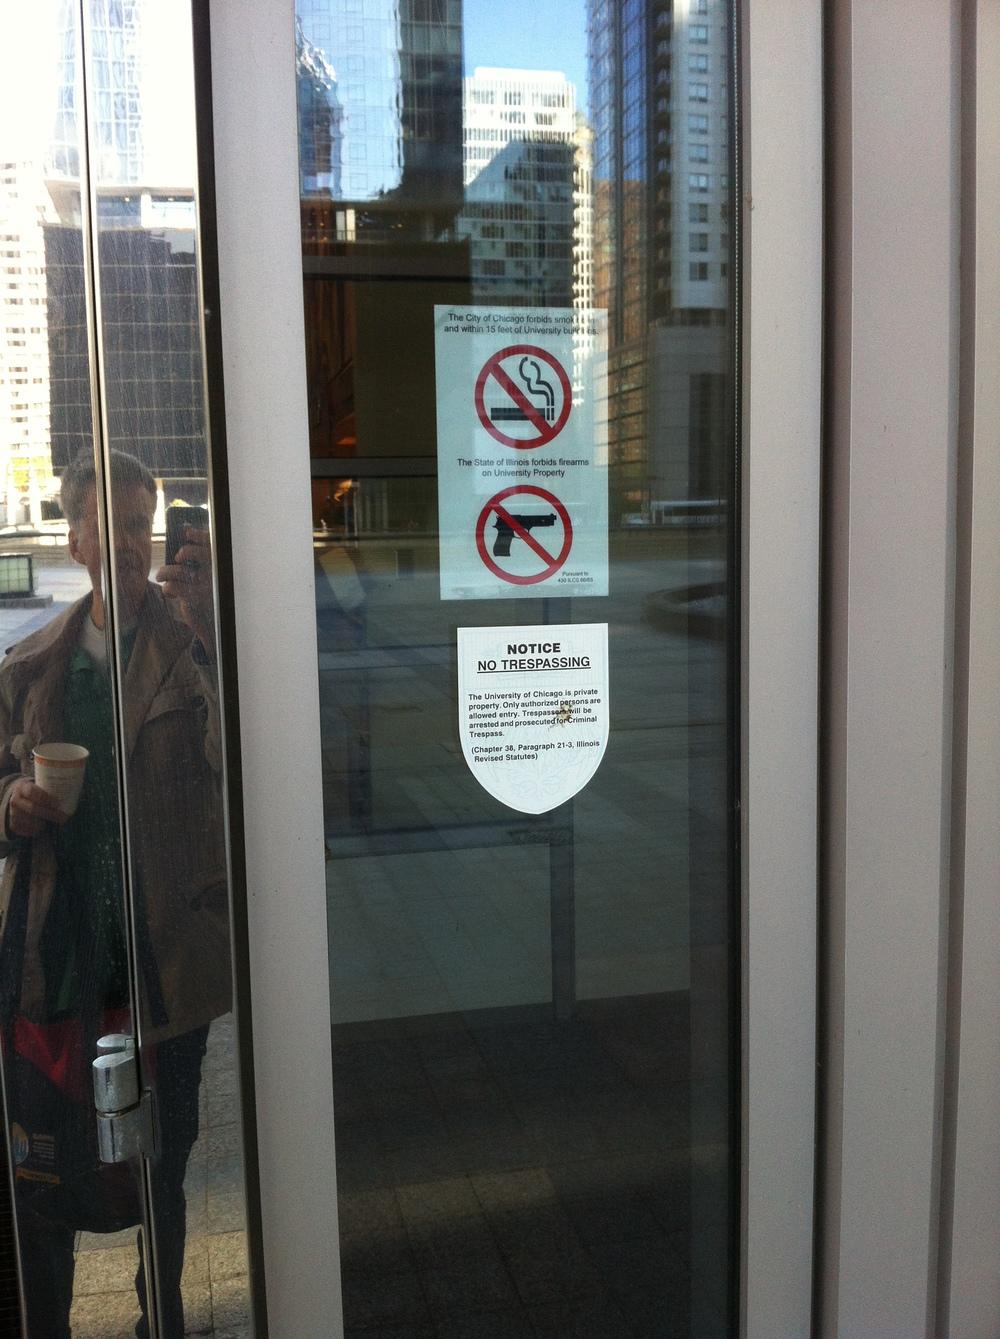 Hinweisschild in Chicago Downtown am Office Eingang: Du sollst nicht töten!